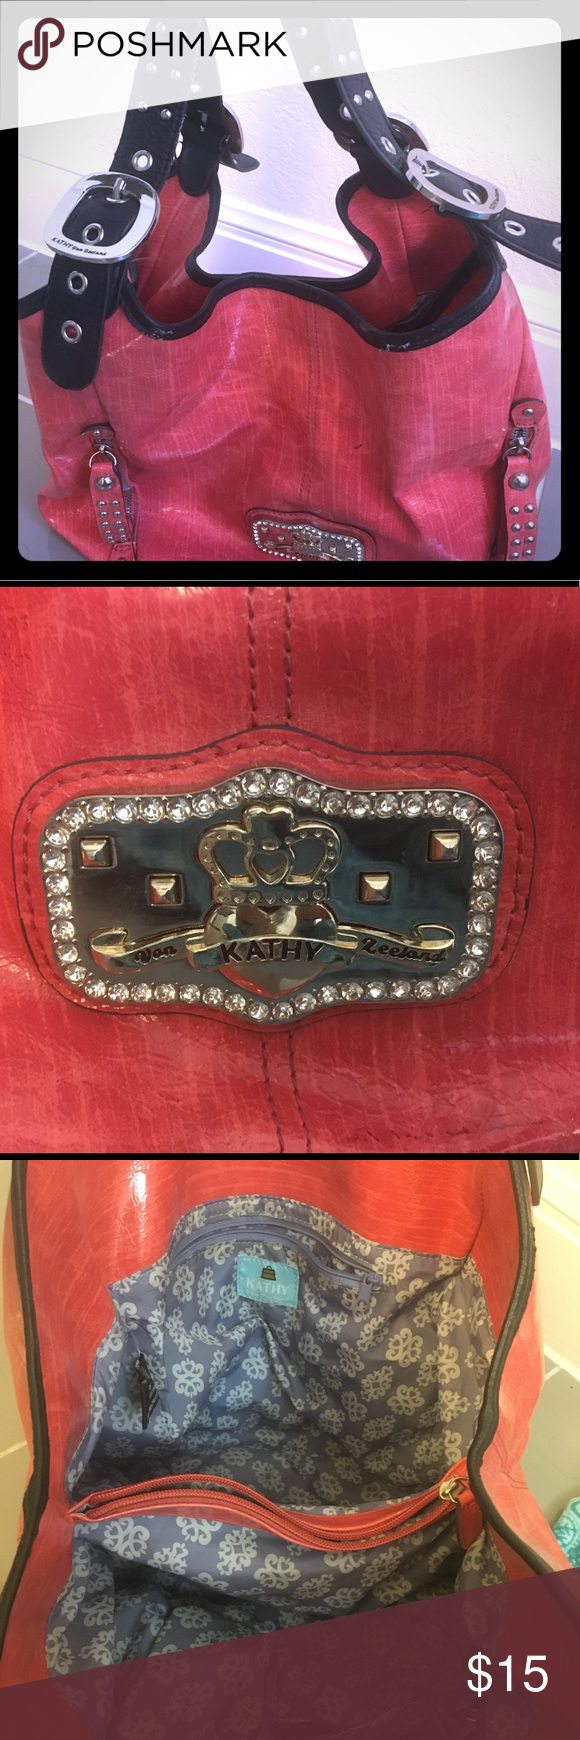 cc05fa4a76 Kathy Van Zeeland Coral Faux Leather Hobo Bag